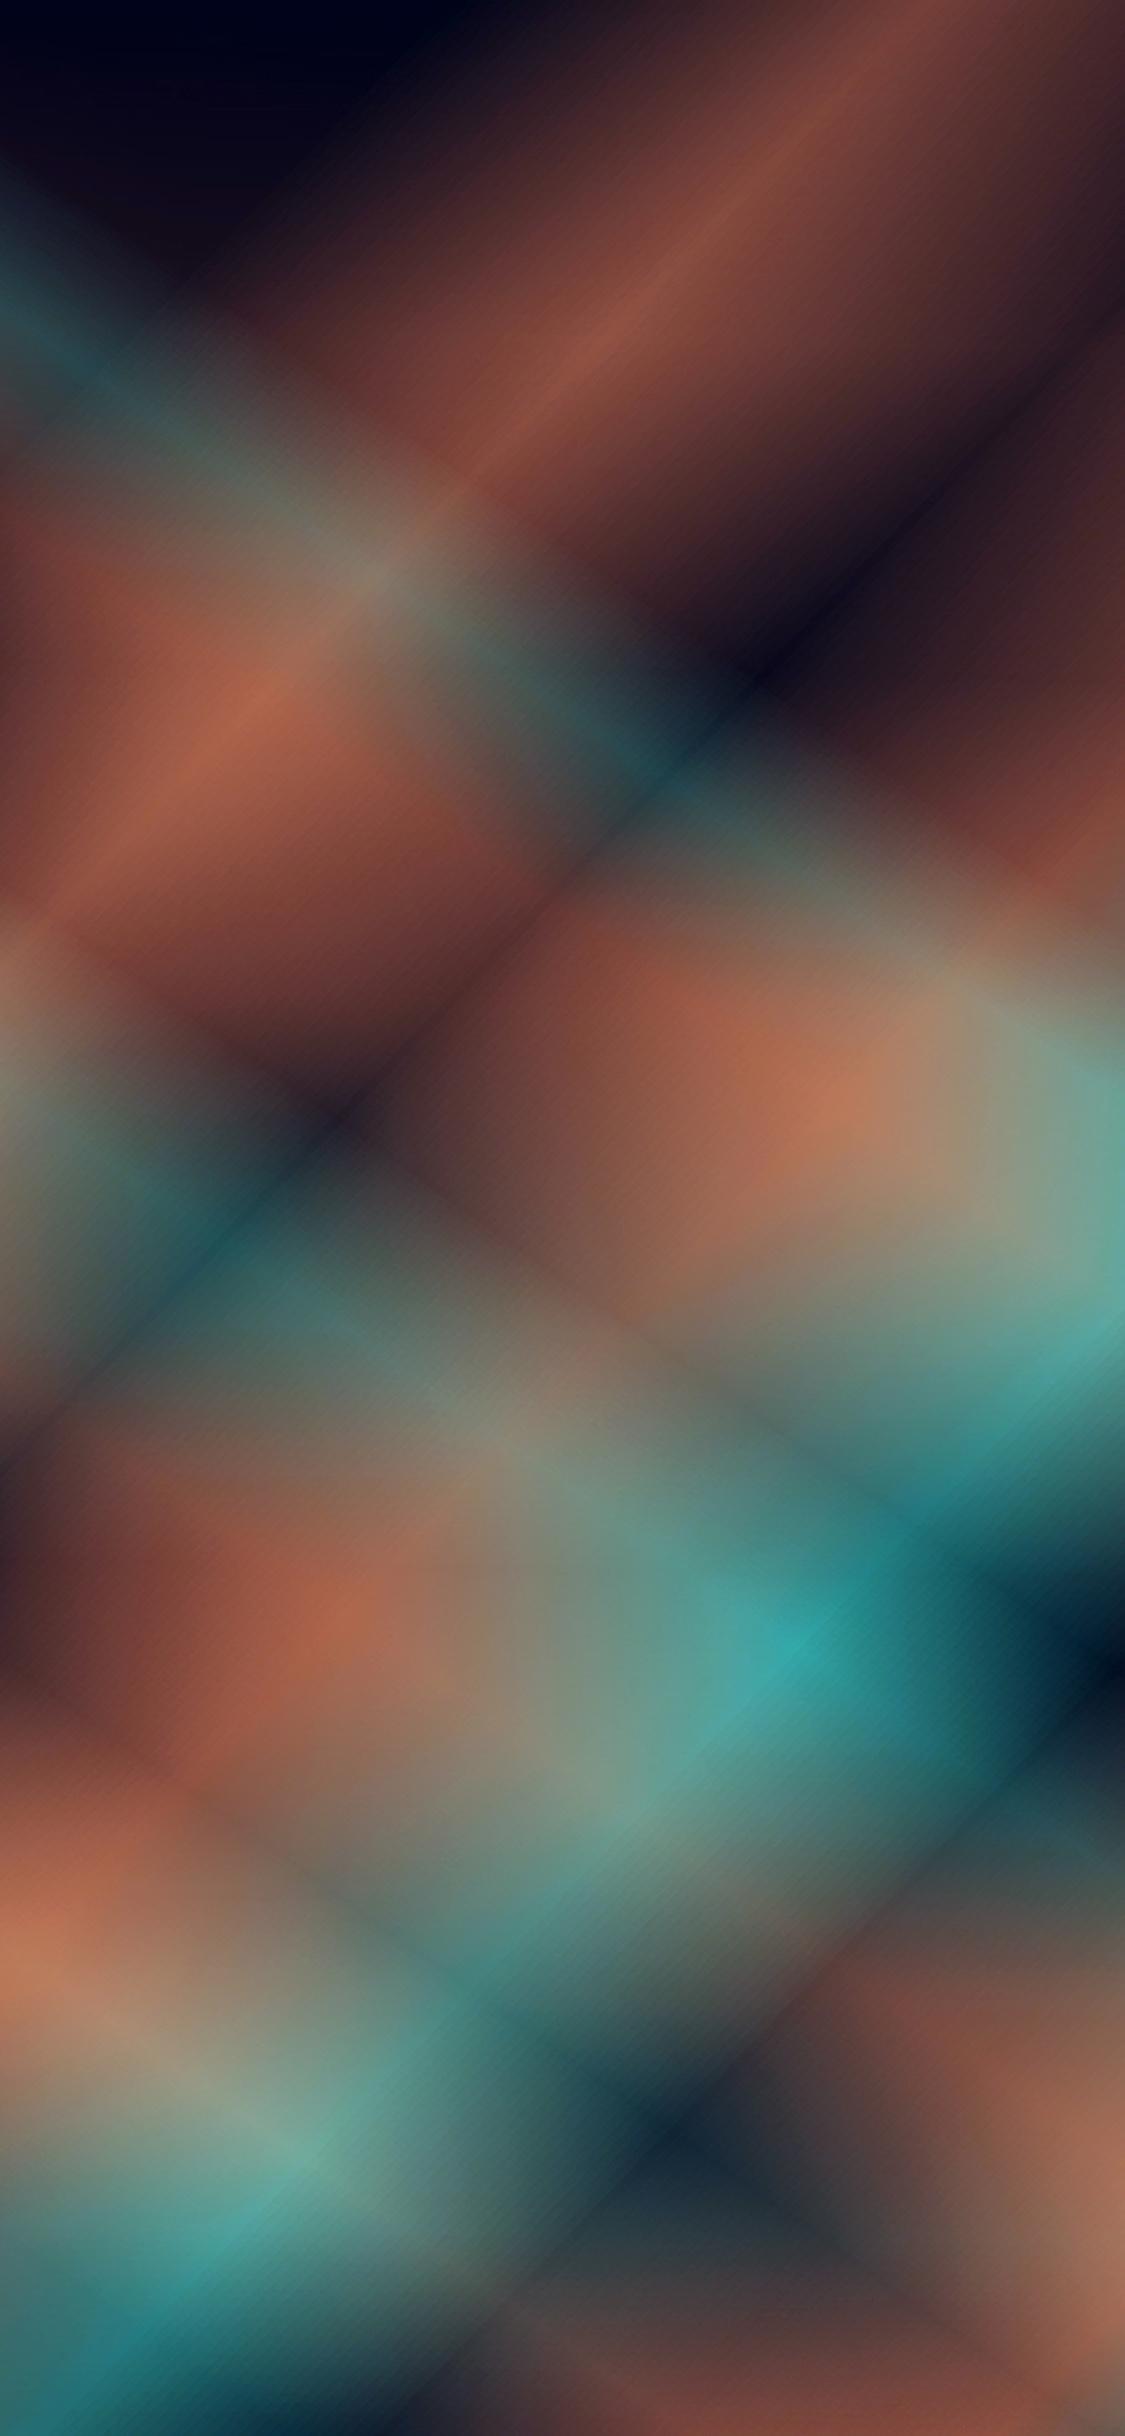 iPhoneXpapers.com-Apple-iPhone-wallpaper-vi38-blurry-lines-dark-orange-pattern